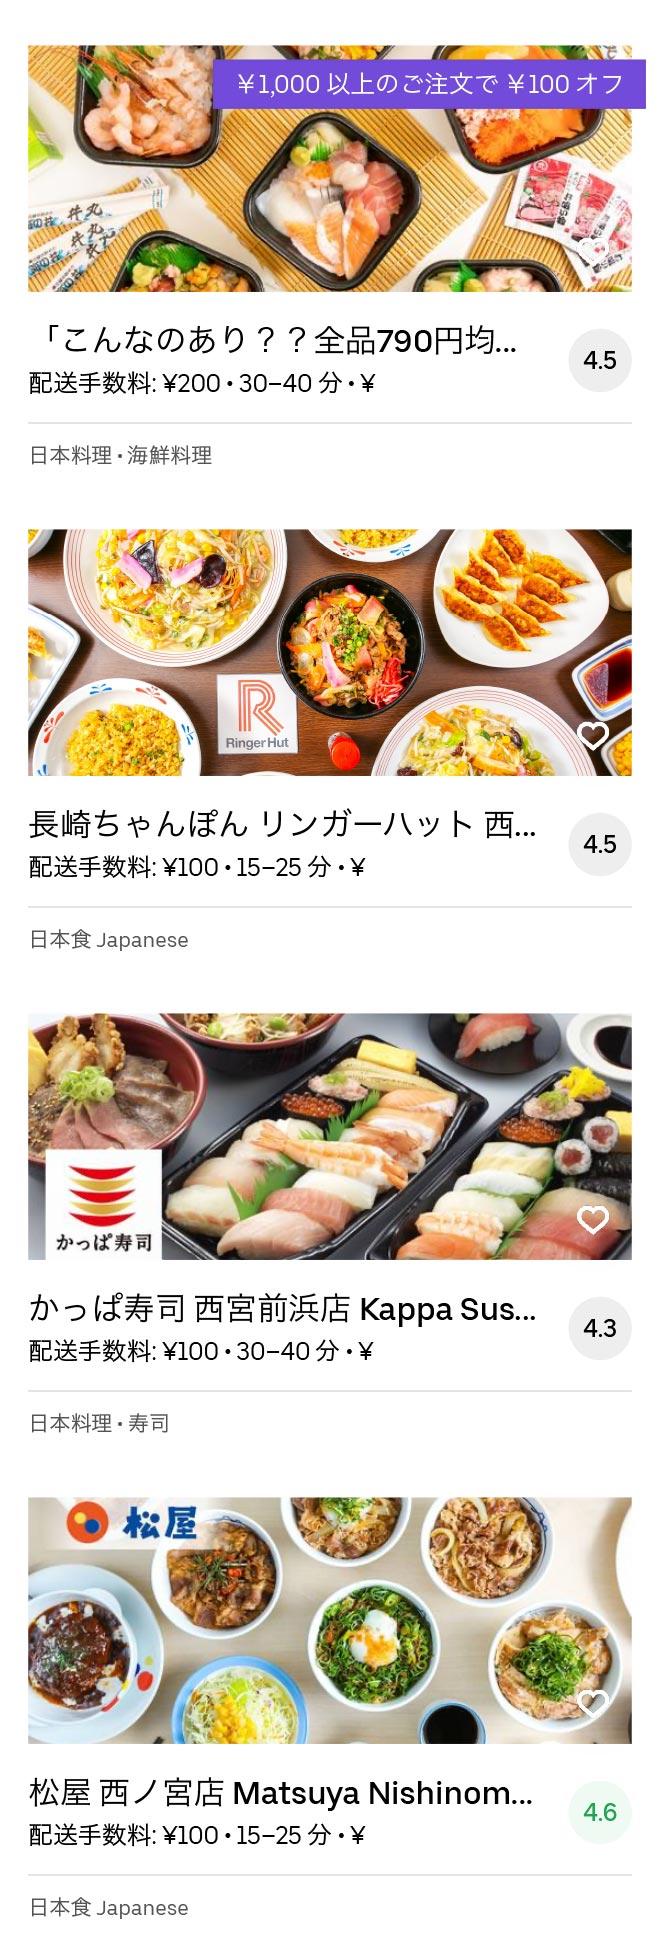 Nishinomiya hanshin menu 2005 06